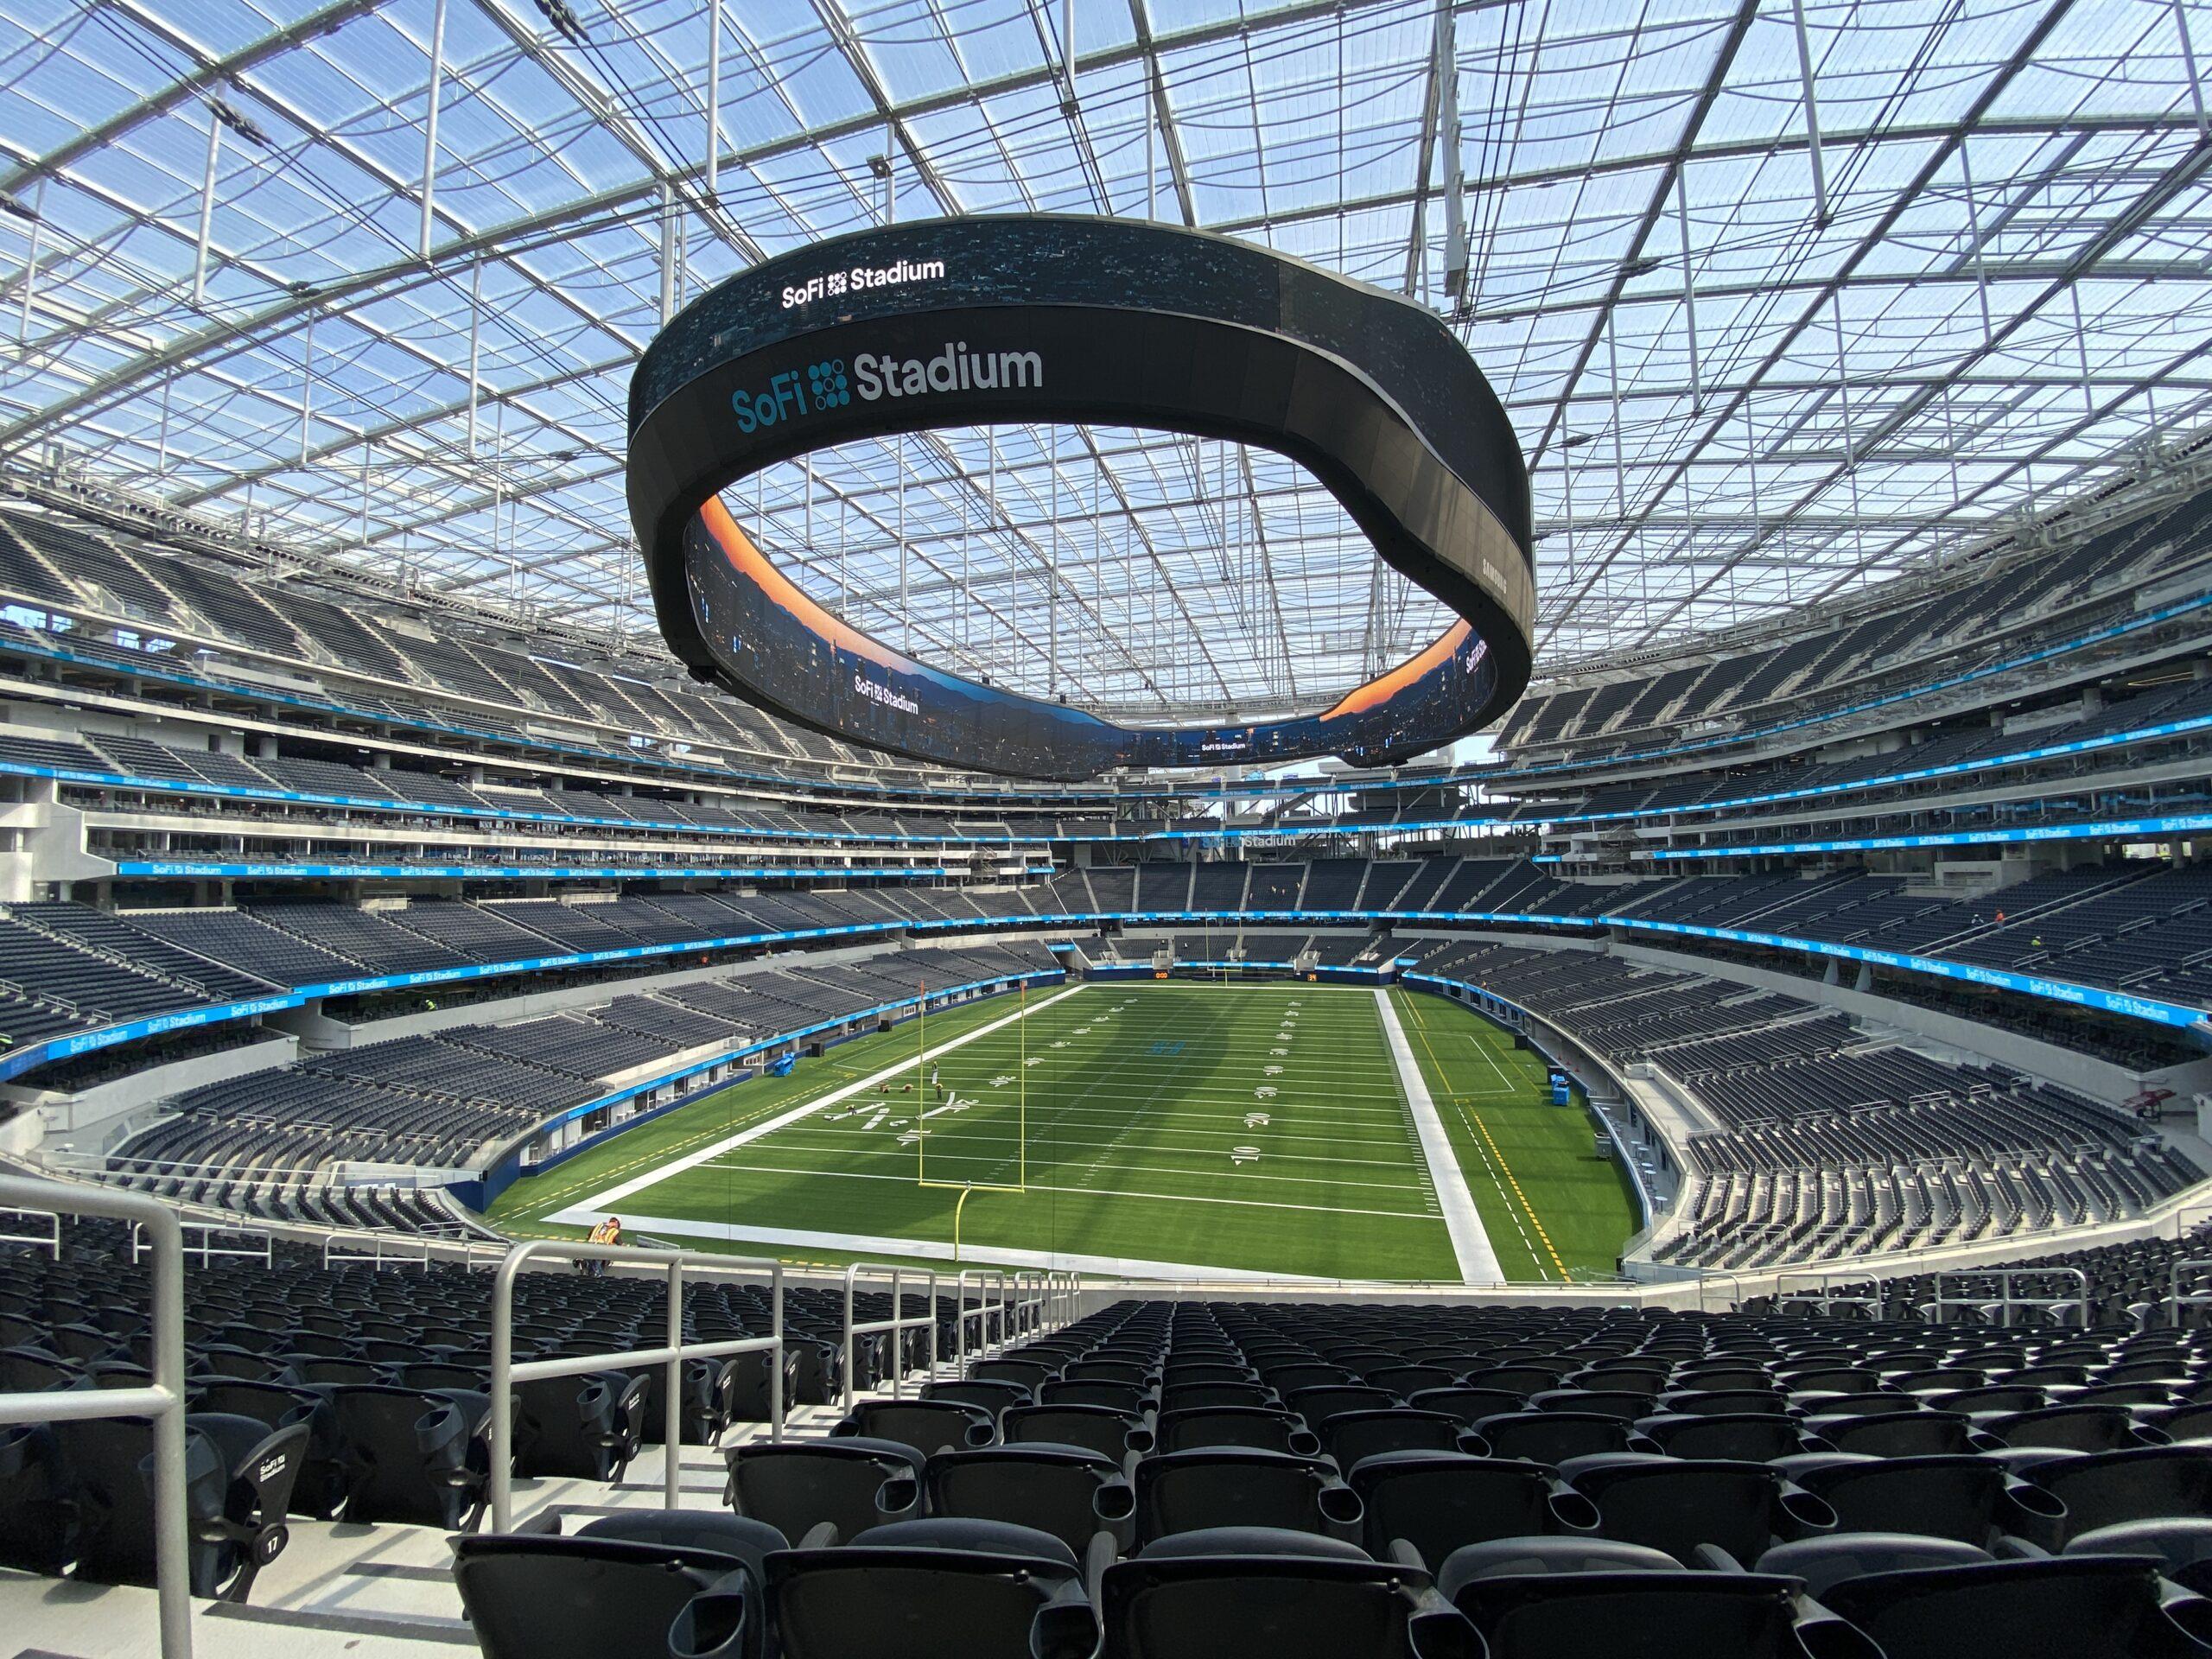 SoFi Stadium Videoboard 2